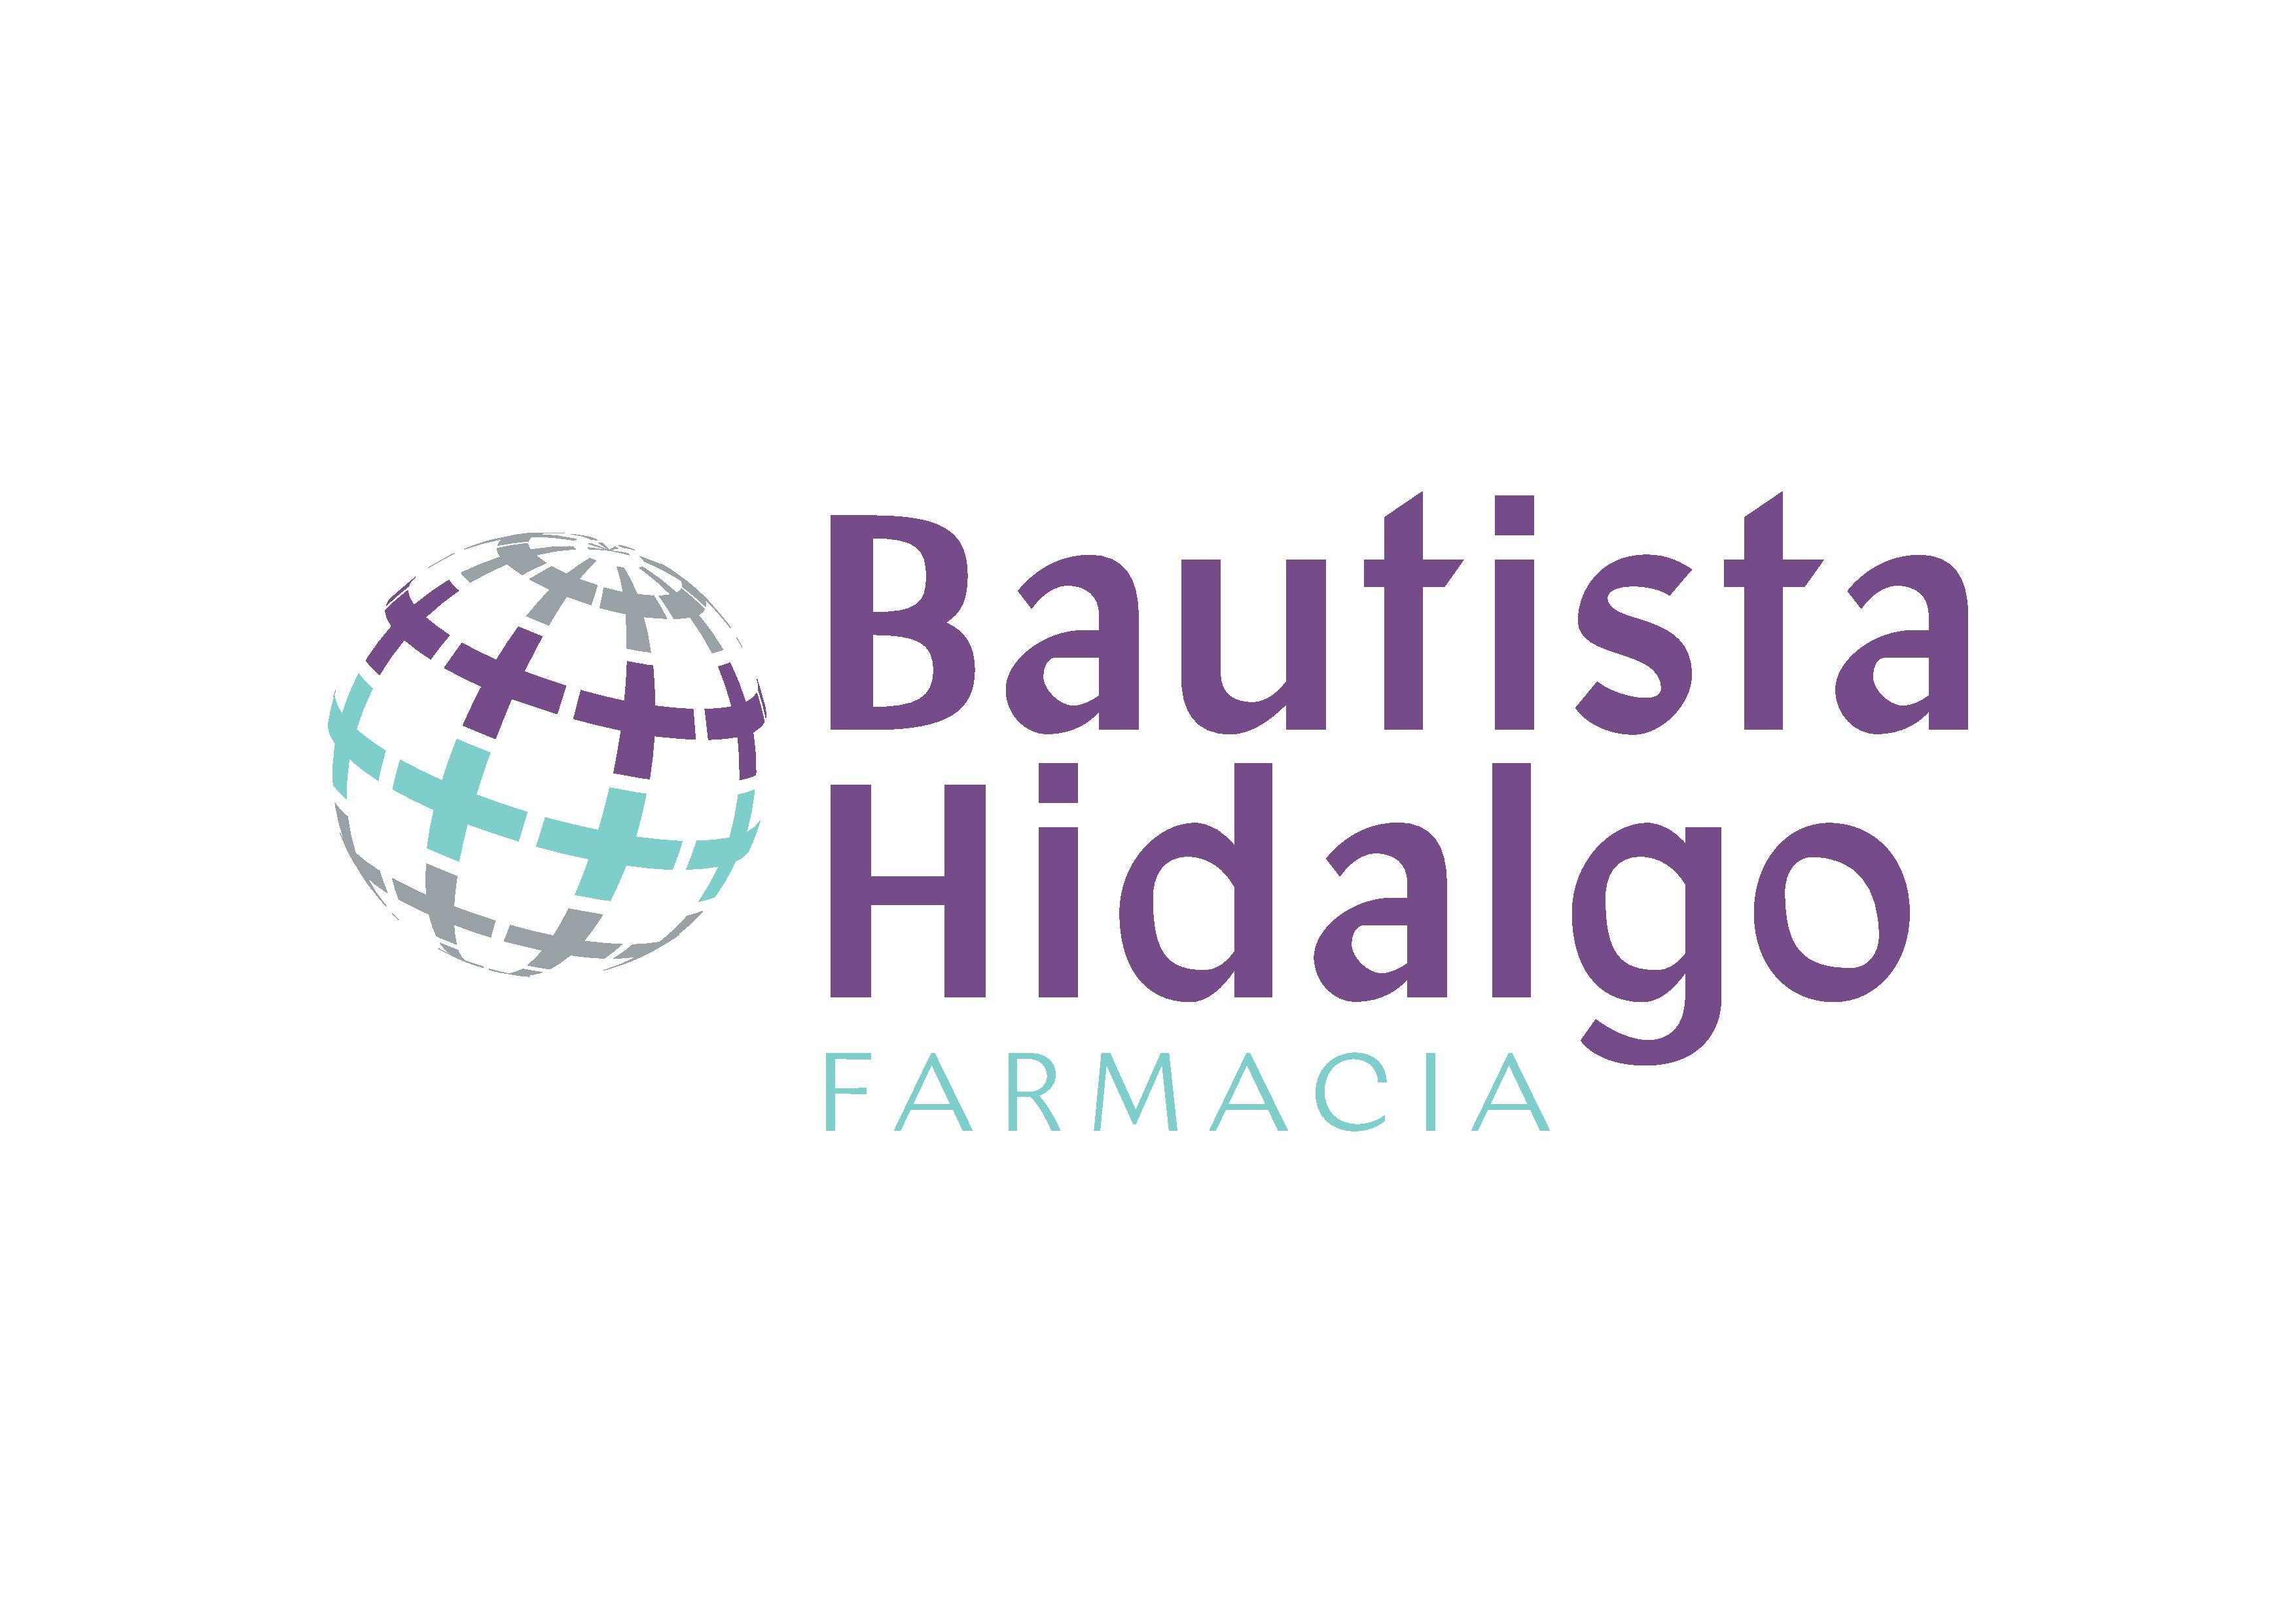 Bautista Hidalgo Farmacia